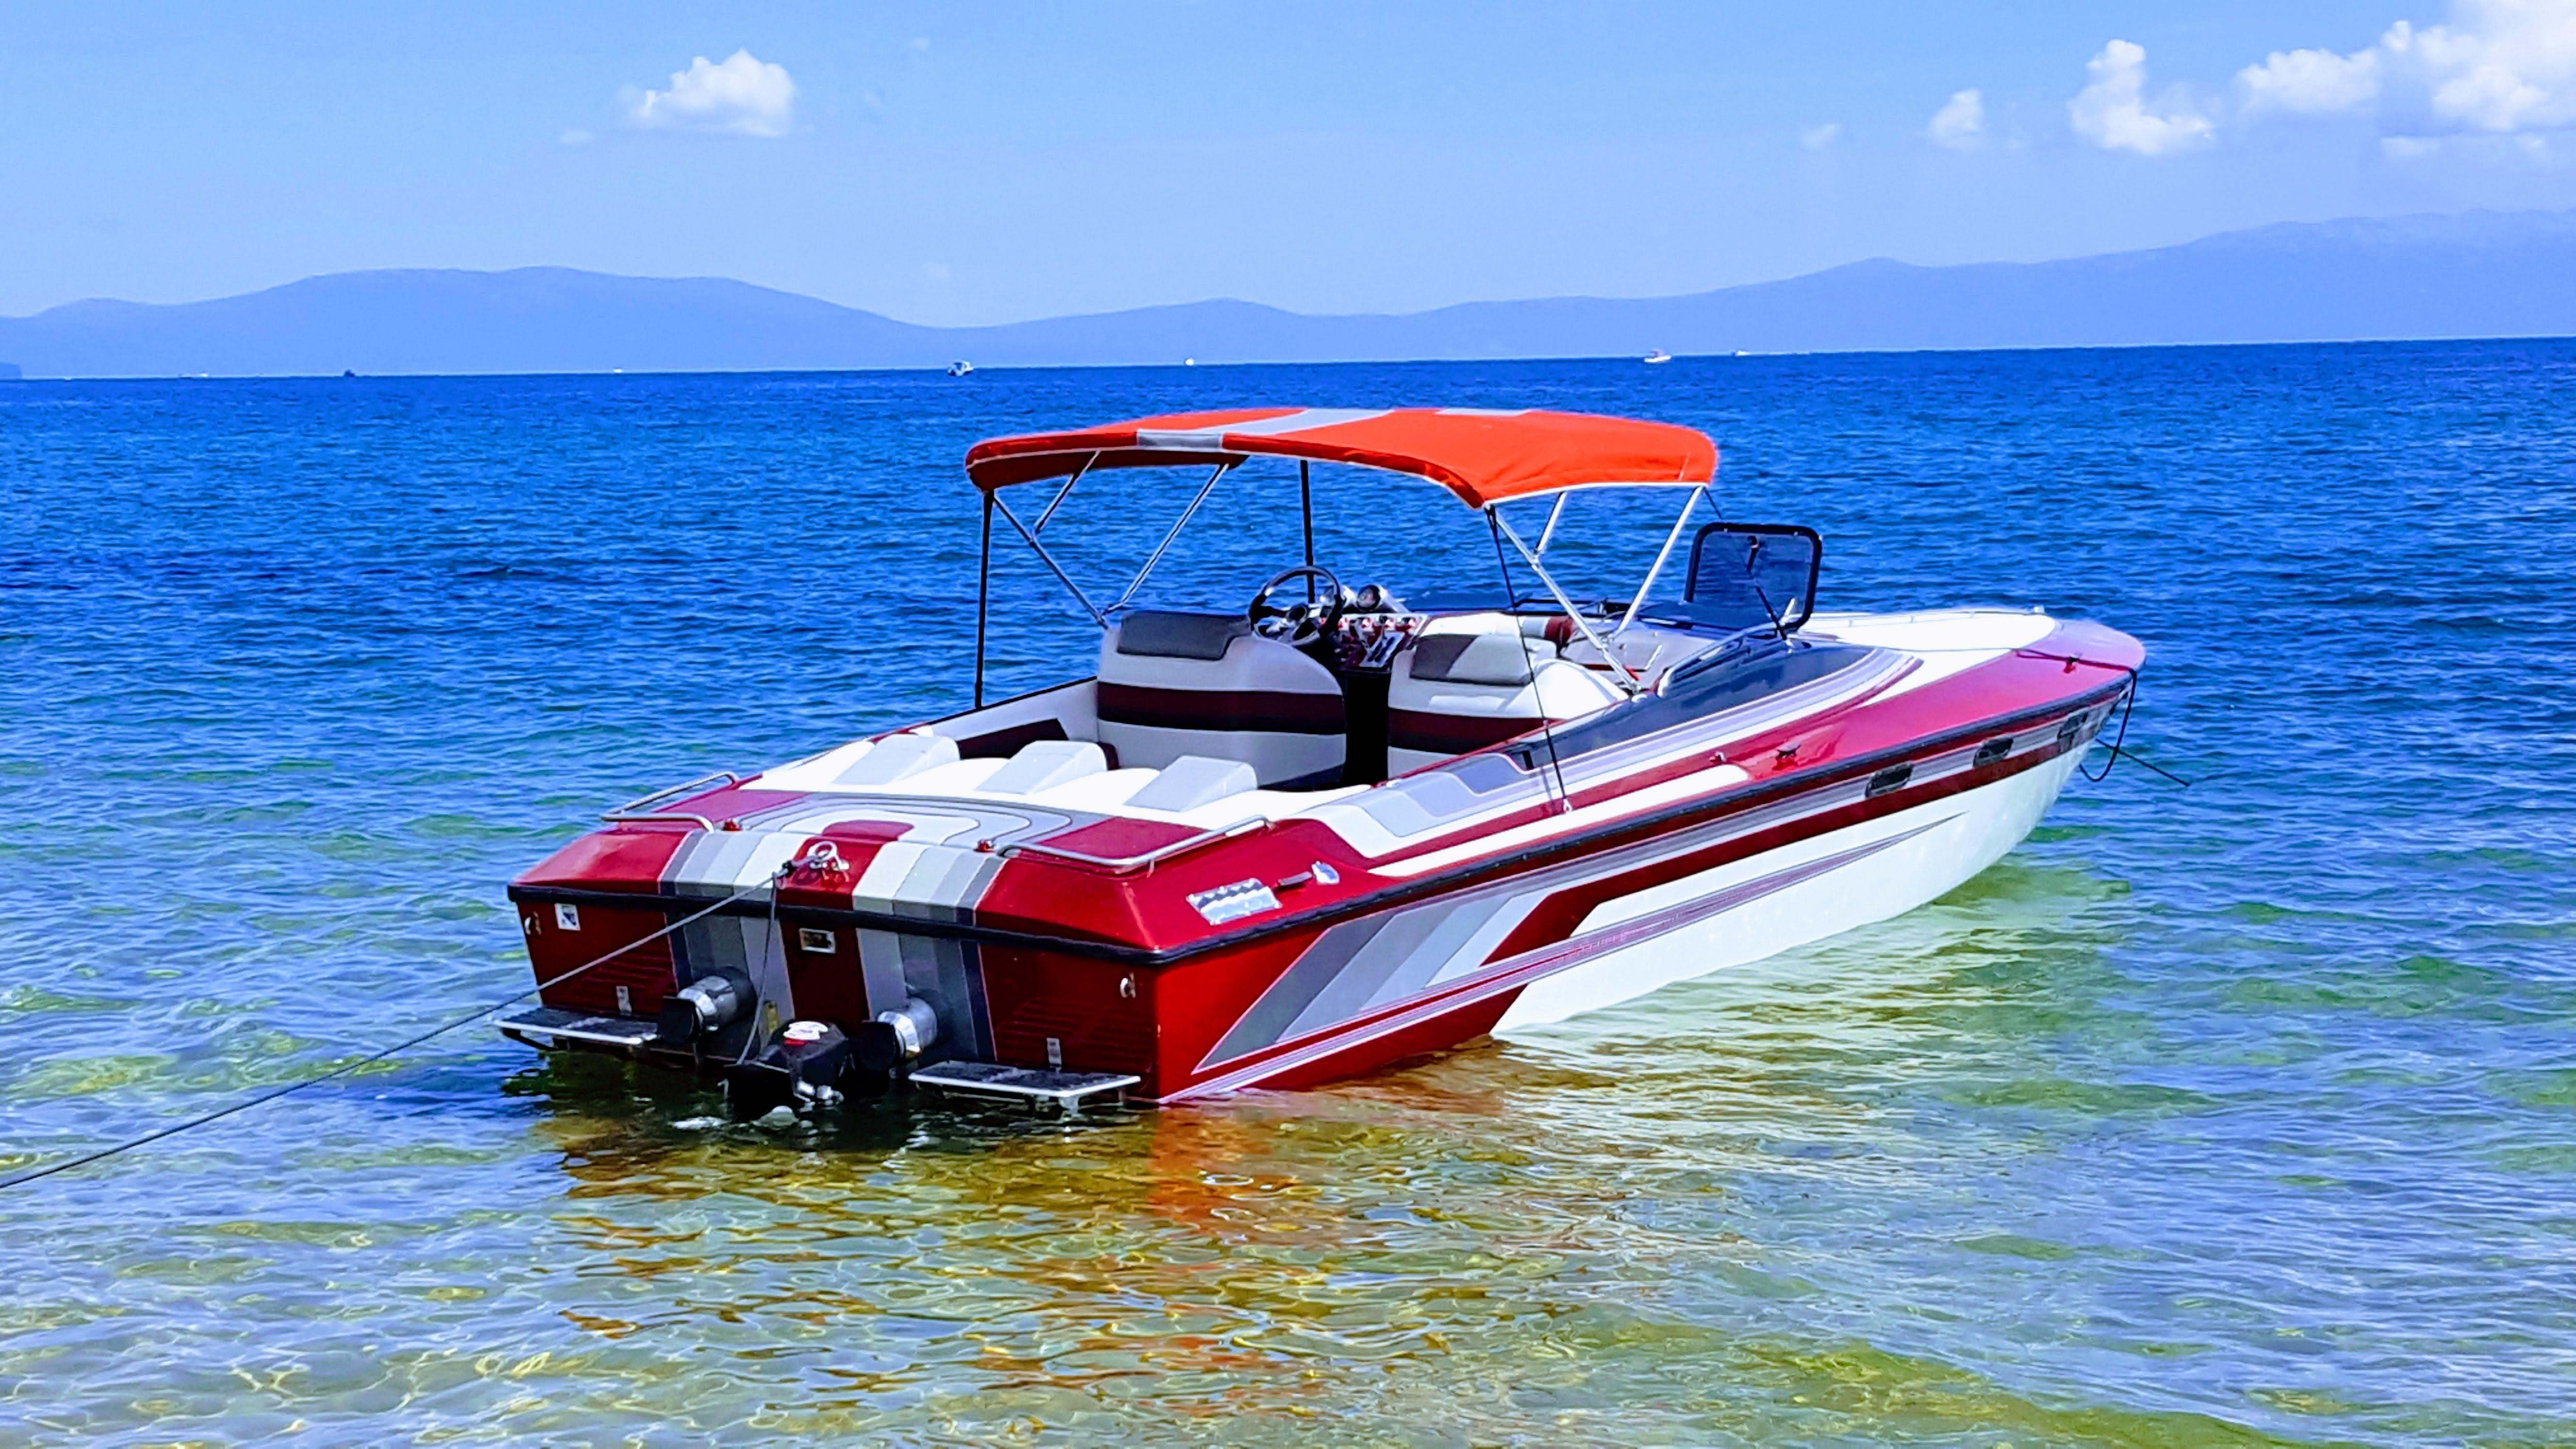 lake lbj yacht rentals